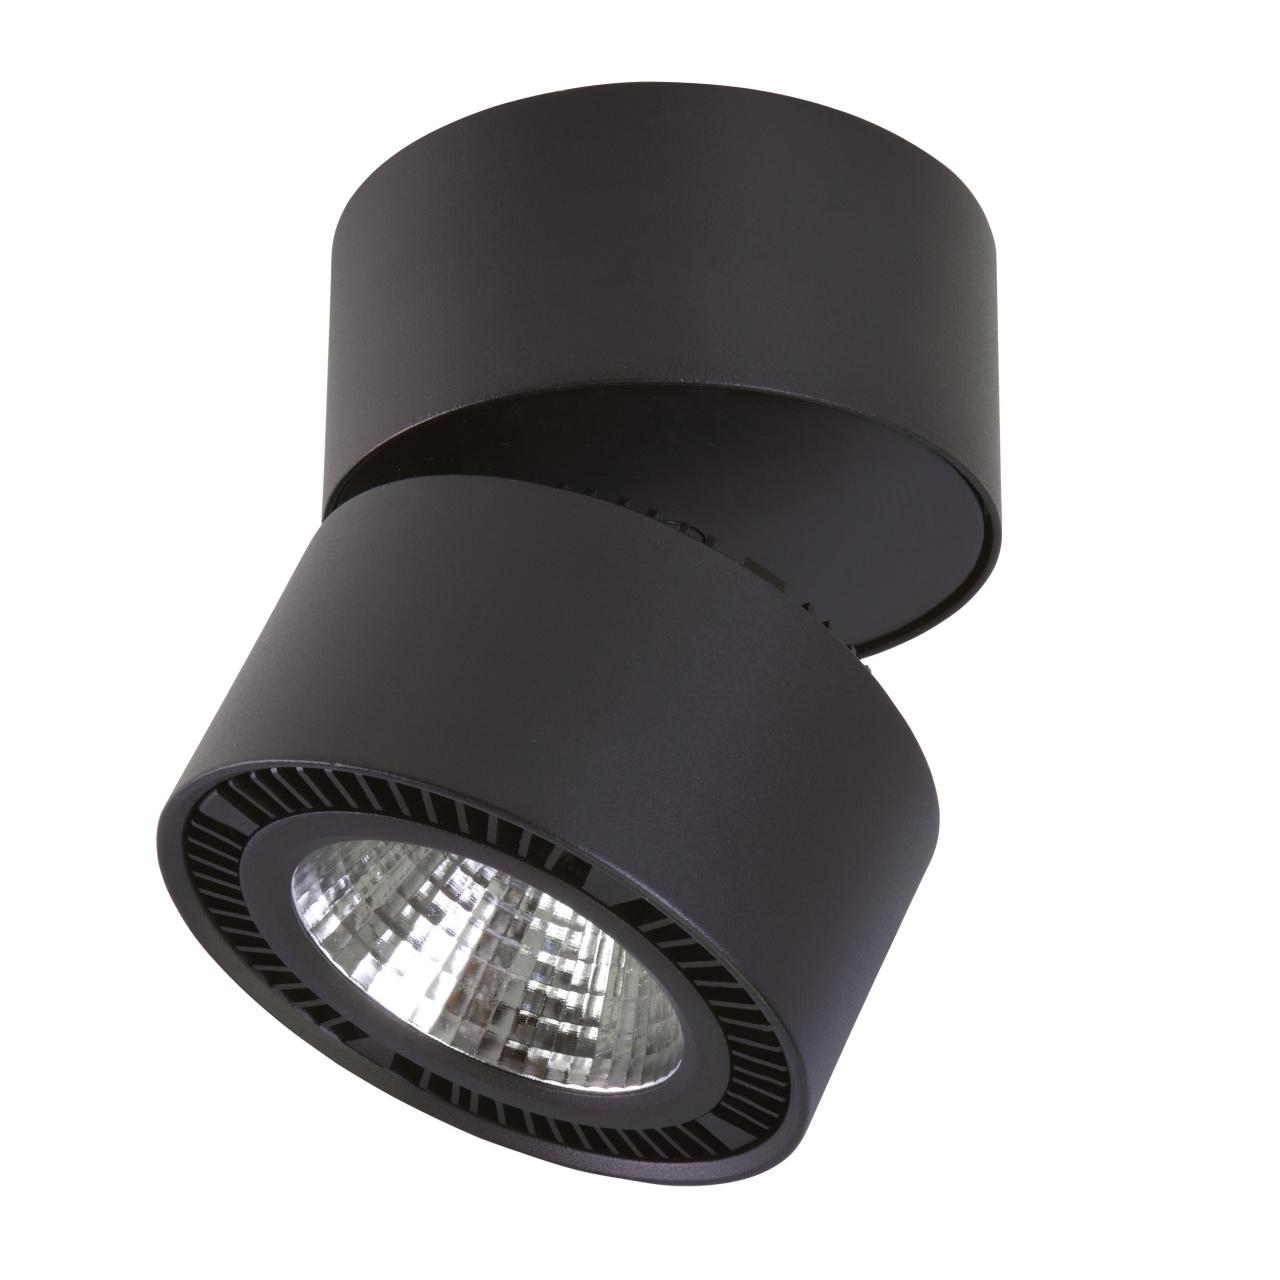 Светильник Forte Muro LED 40W 3400LM 30G черный 4000K Lightstar 214857